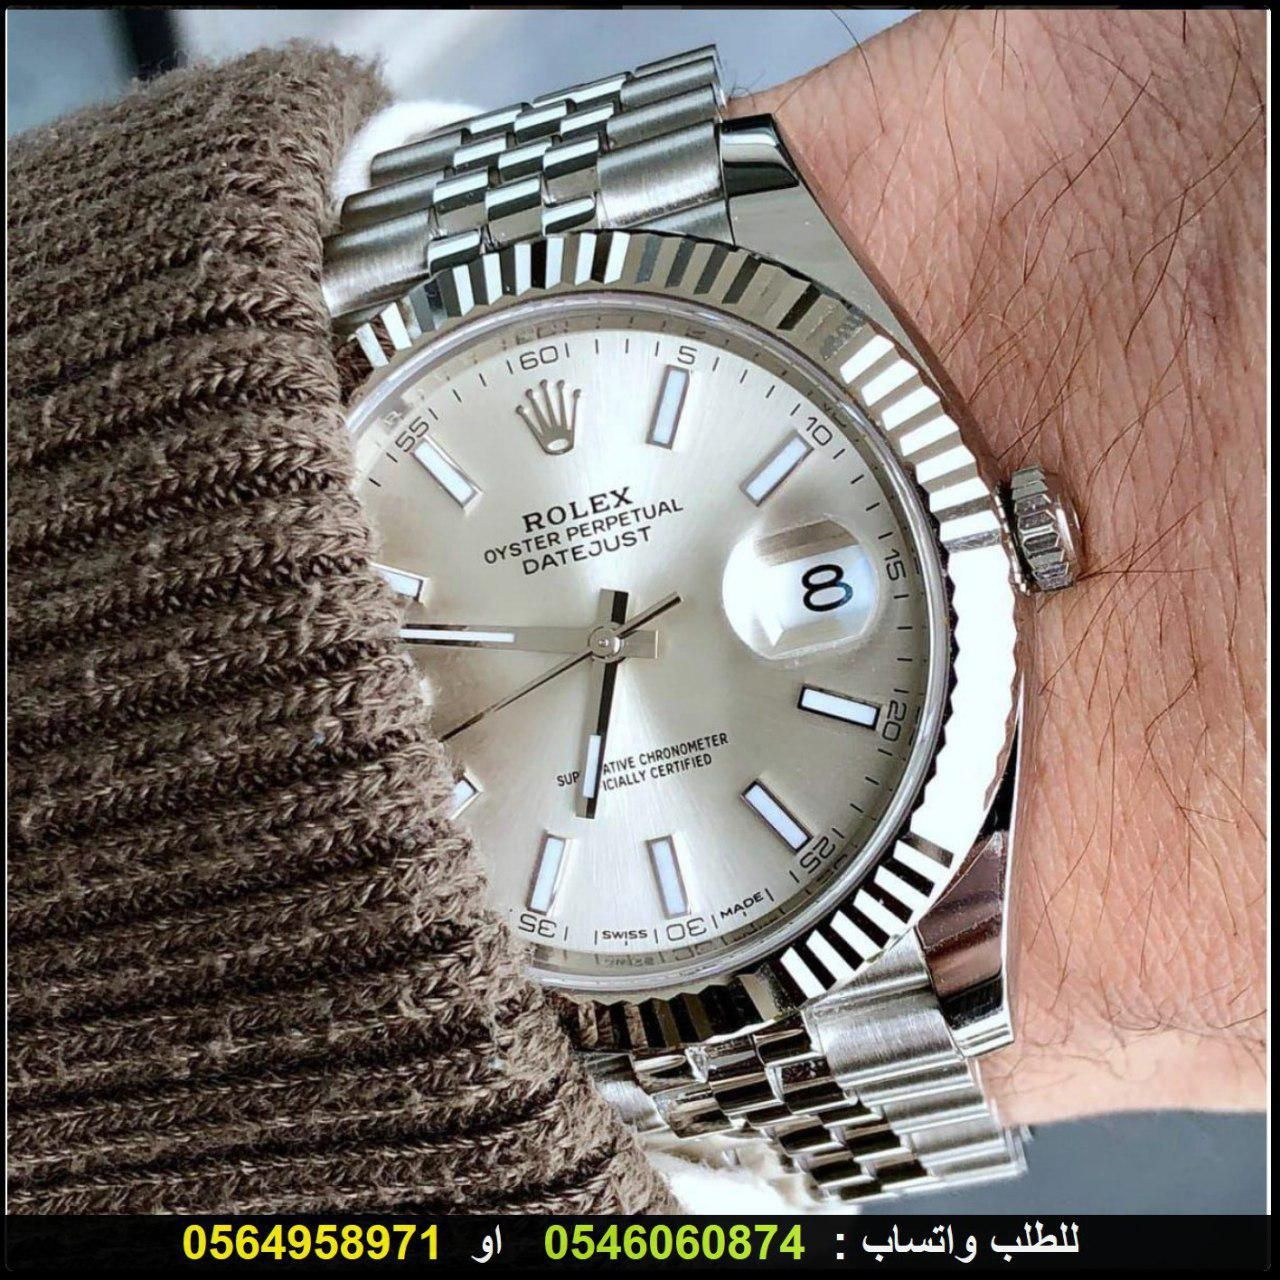 ساعات رولكس كلاسيك رجالي Rolex بقفل عريض مع الملحقات هدايا هنوف Mesh Strap Watch Mesh Strap Rolex Watches